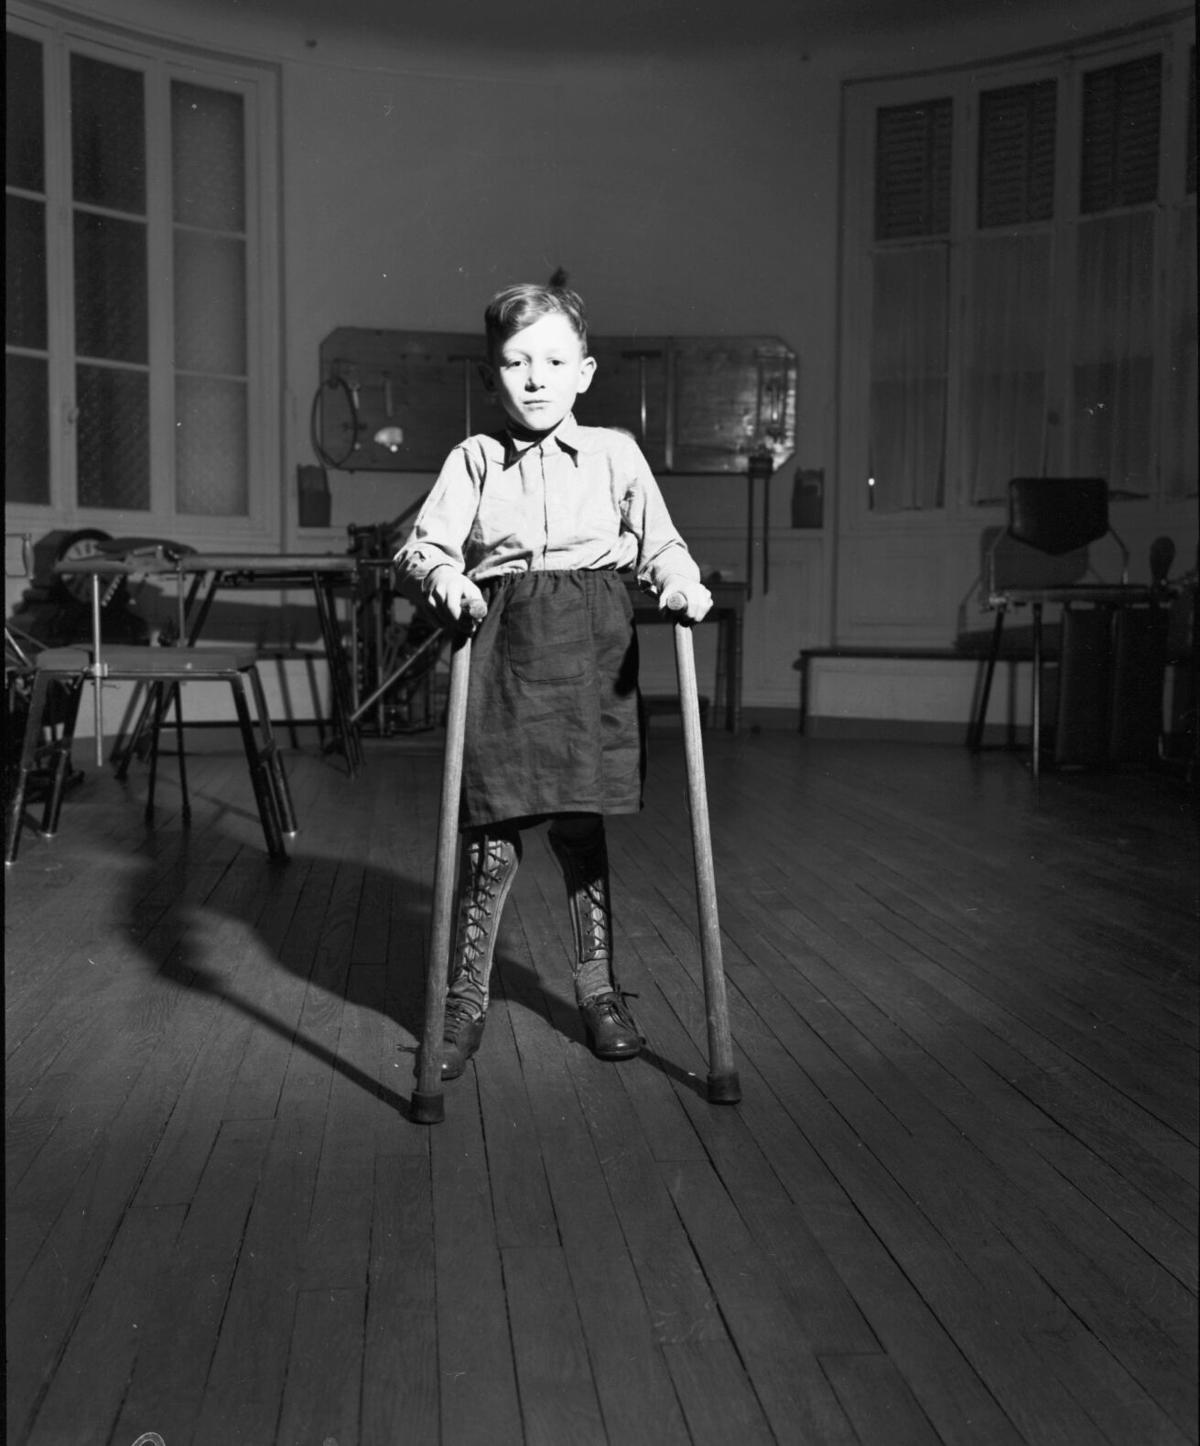 Polio_ArchiveImg.jpg